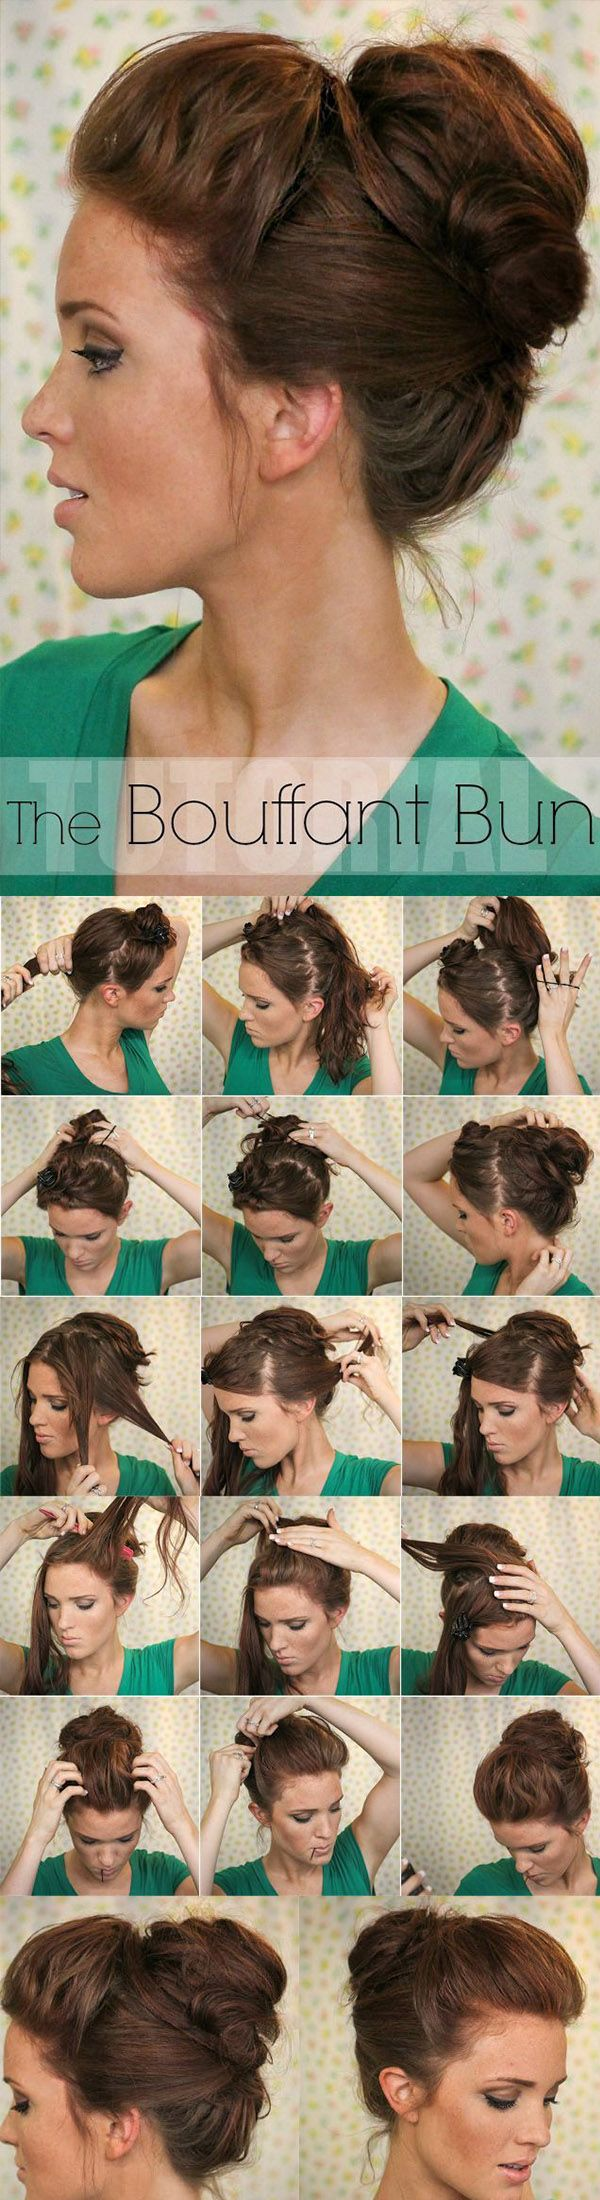 Bouffant Bun - 11 Summer Hair Buns